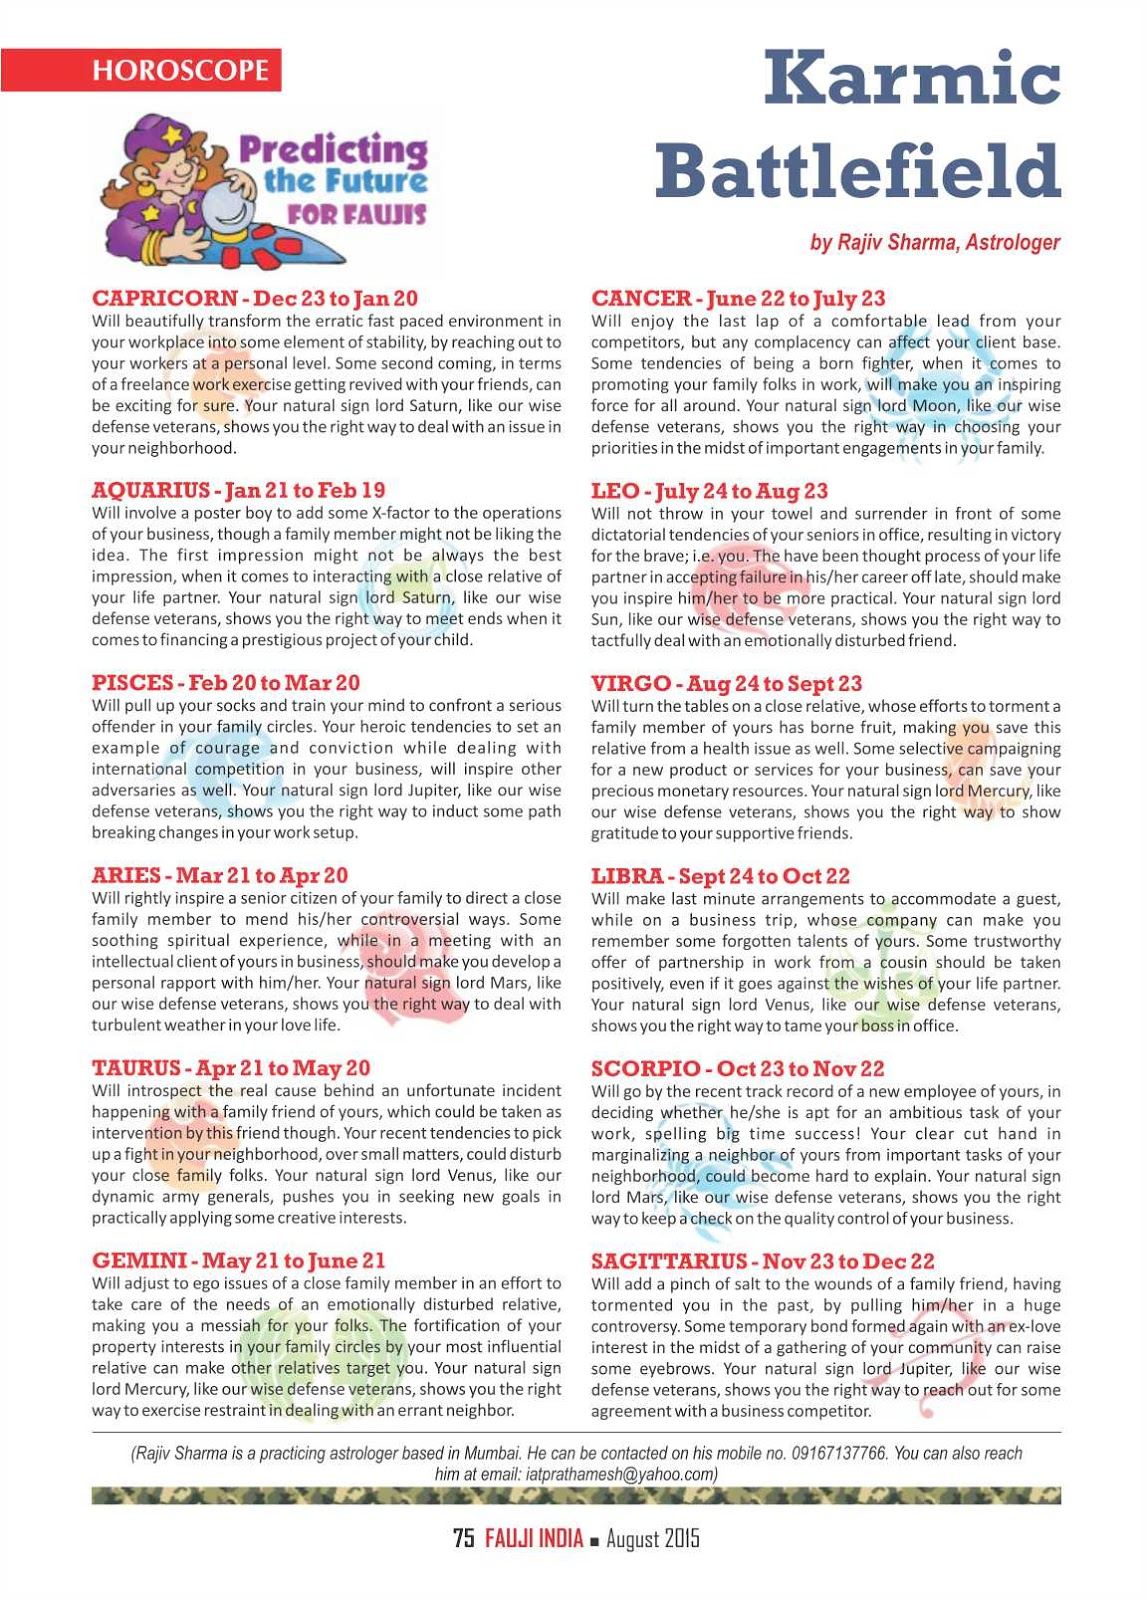 Fauji Magazine: August 2015